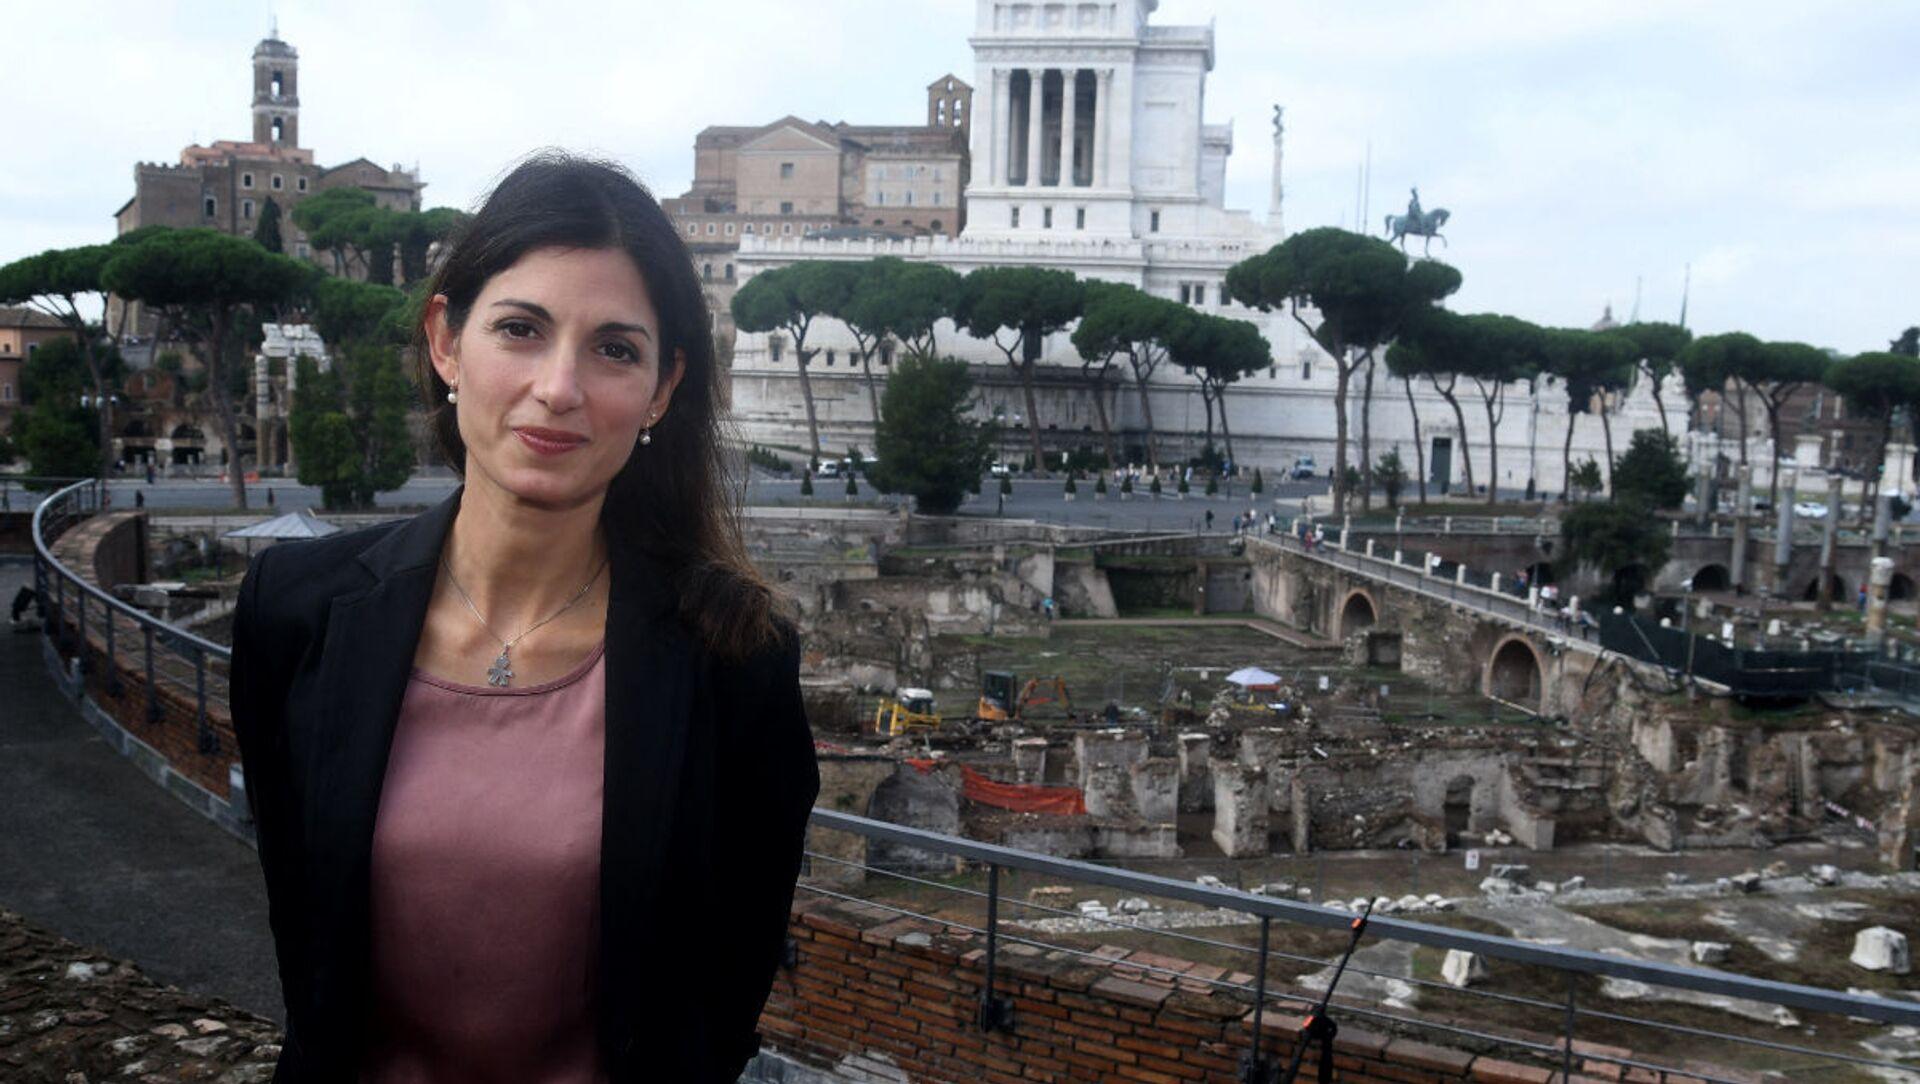 Virginia Raggi, sindaco di Roma Capitale - Sputnik Italia, 1920, 25.03.2021